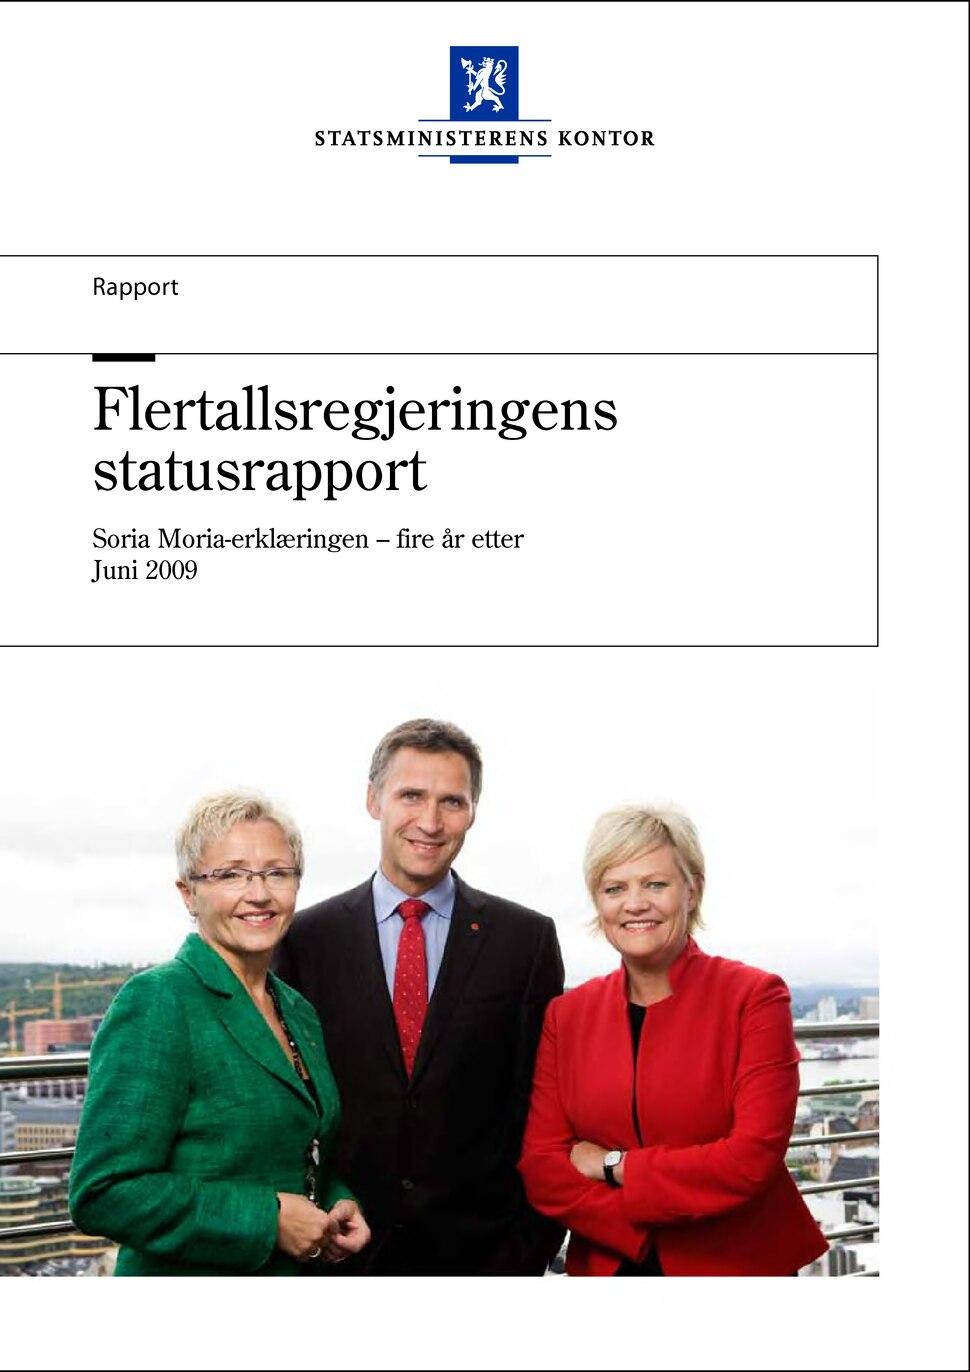 Flertallsregjeringens statusrapport.djvu